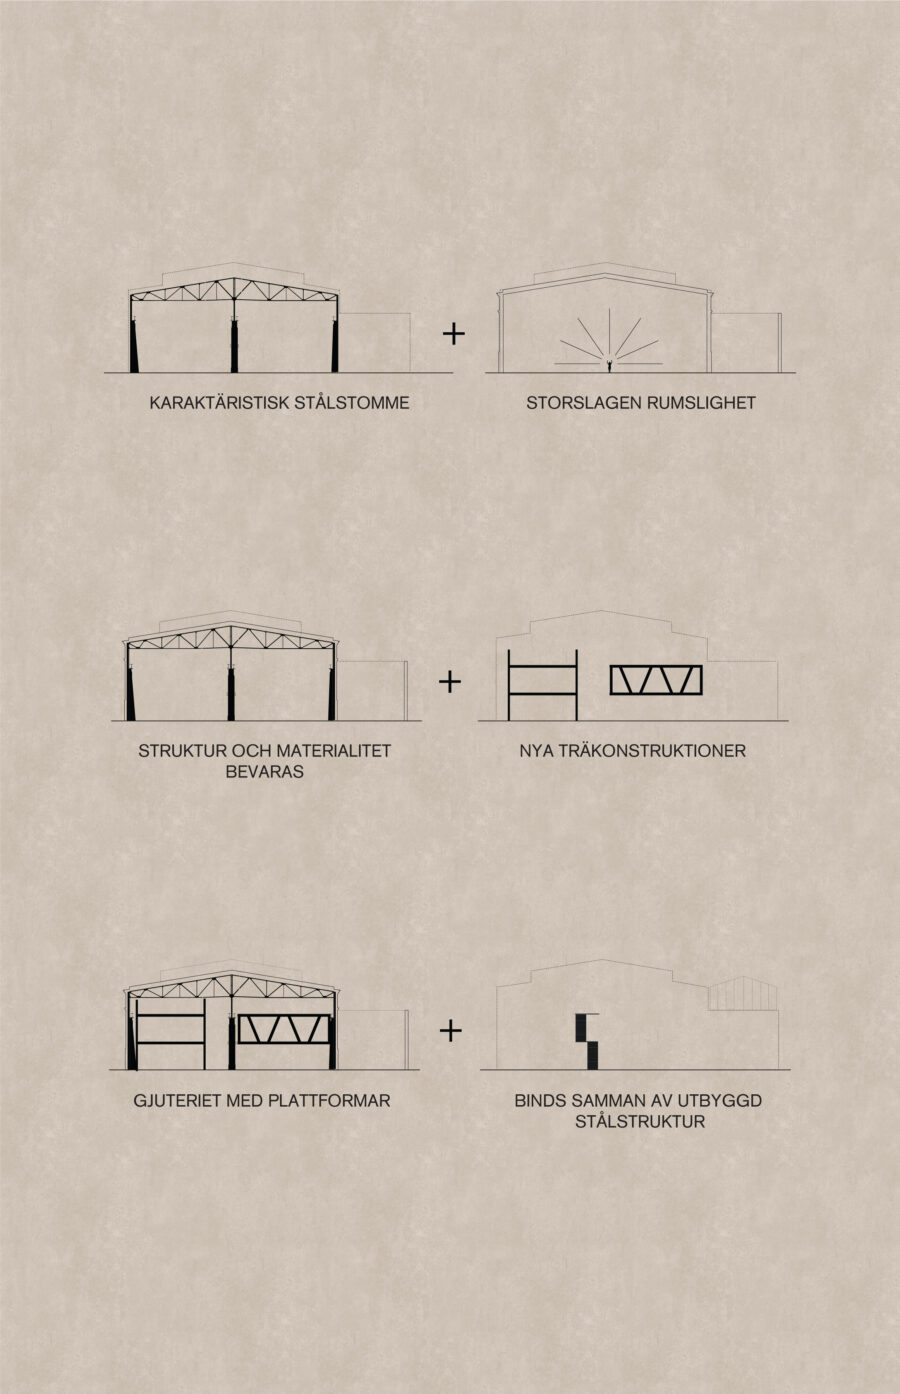 KjellanderSjoberg Gjuteriet Concept Diagram 06 3600x2324px